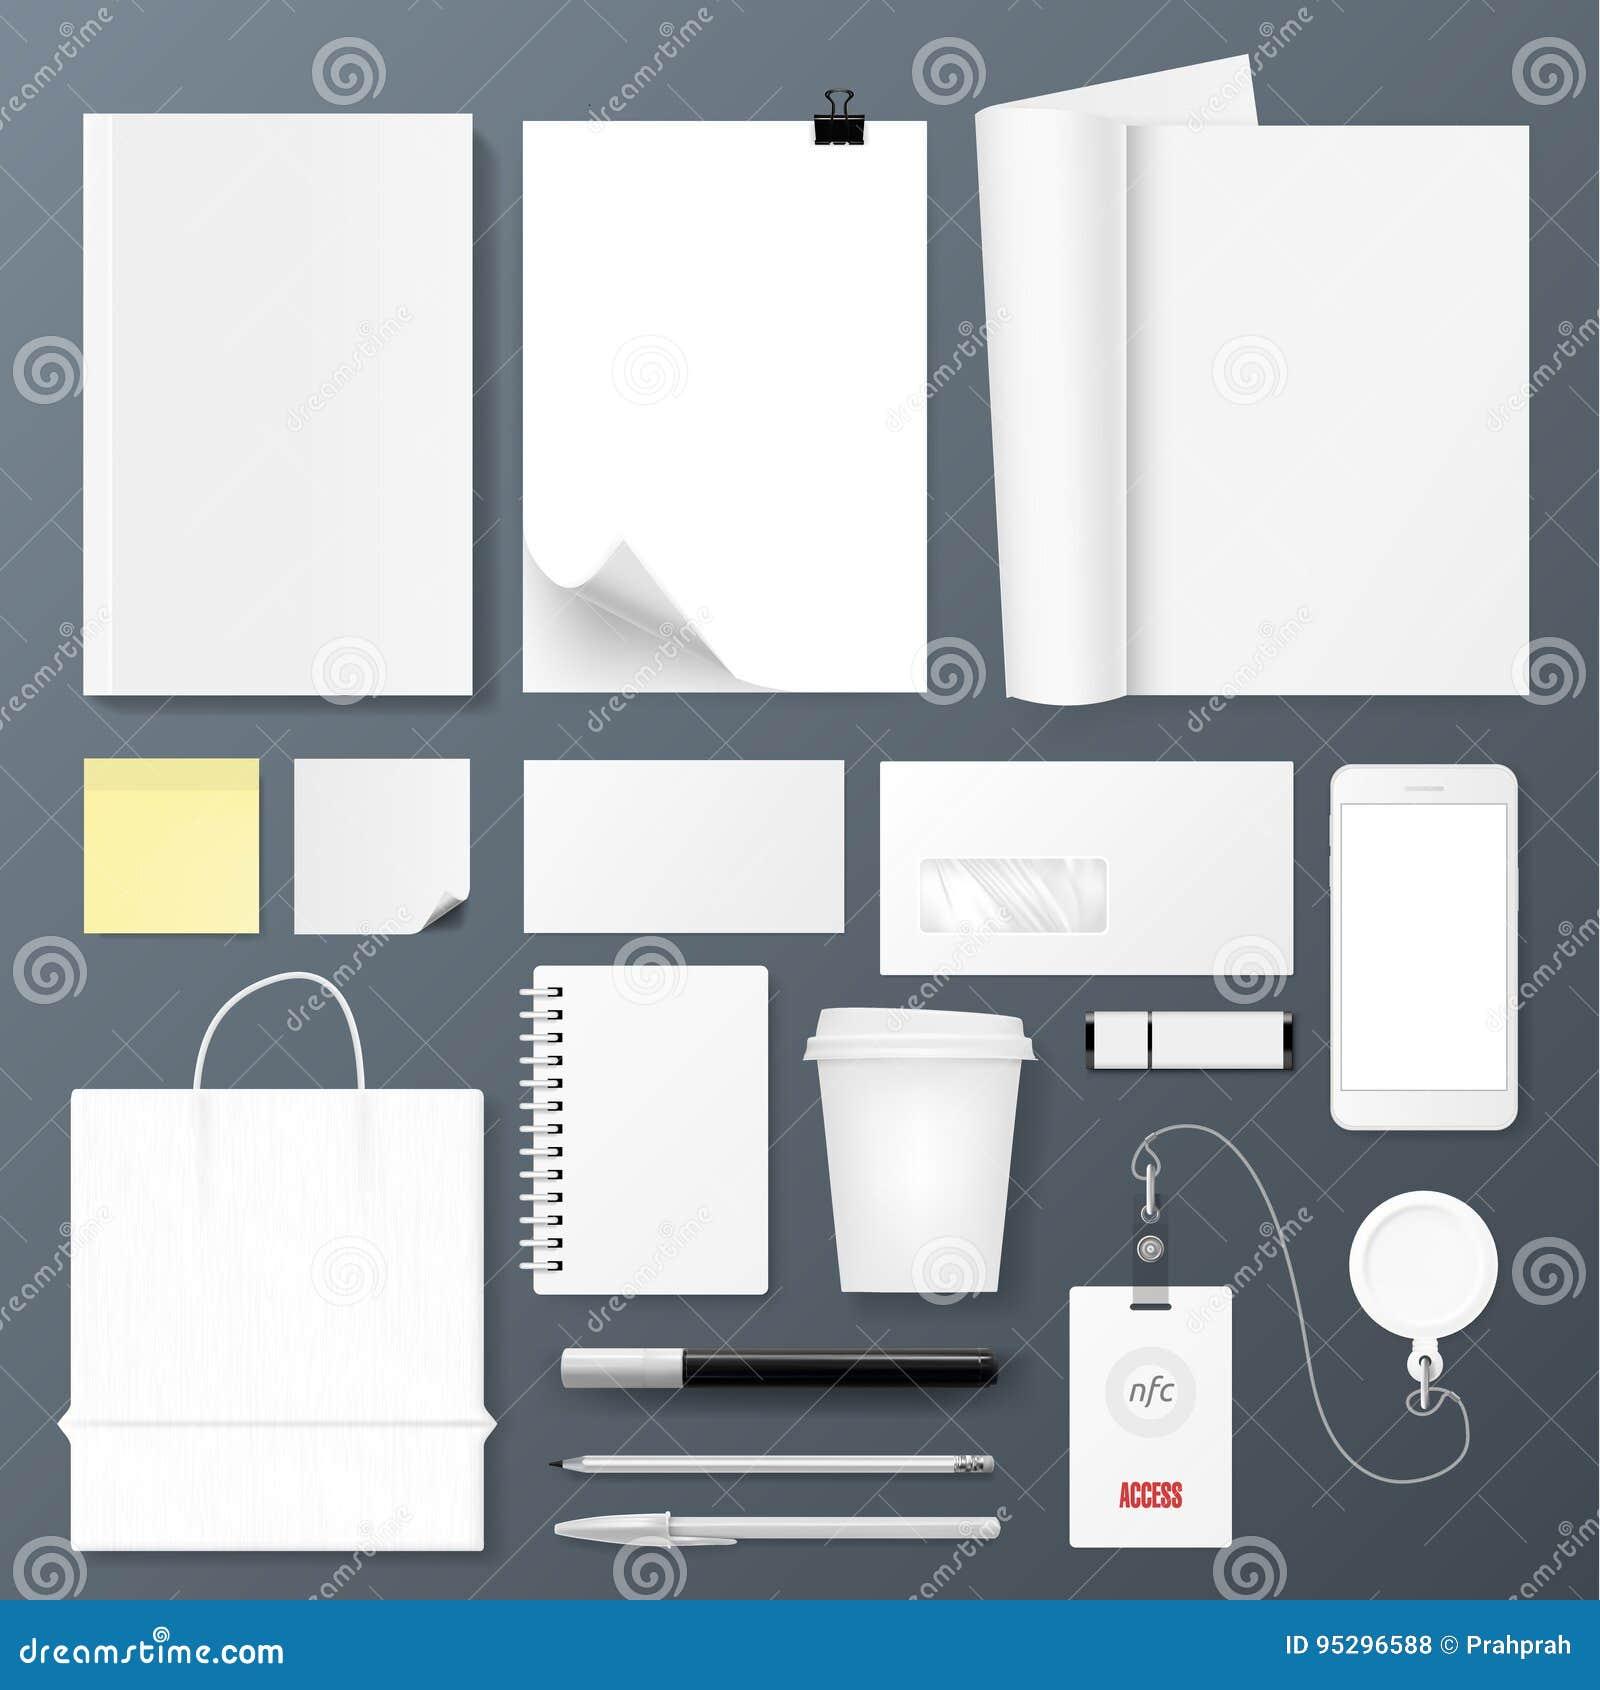 Office Corporate Identity Template Set. Design For Branding